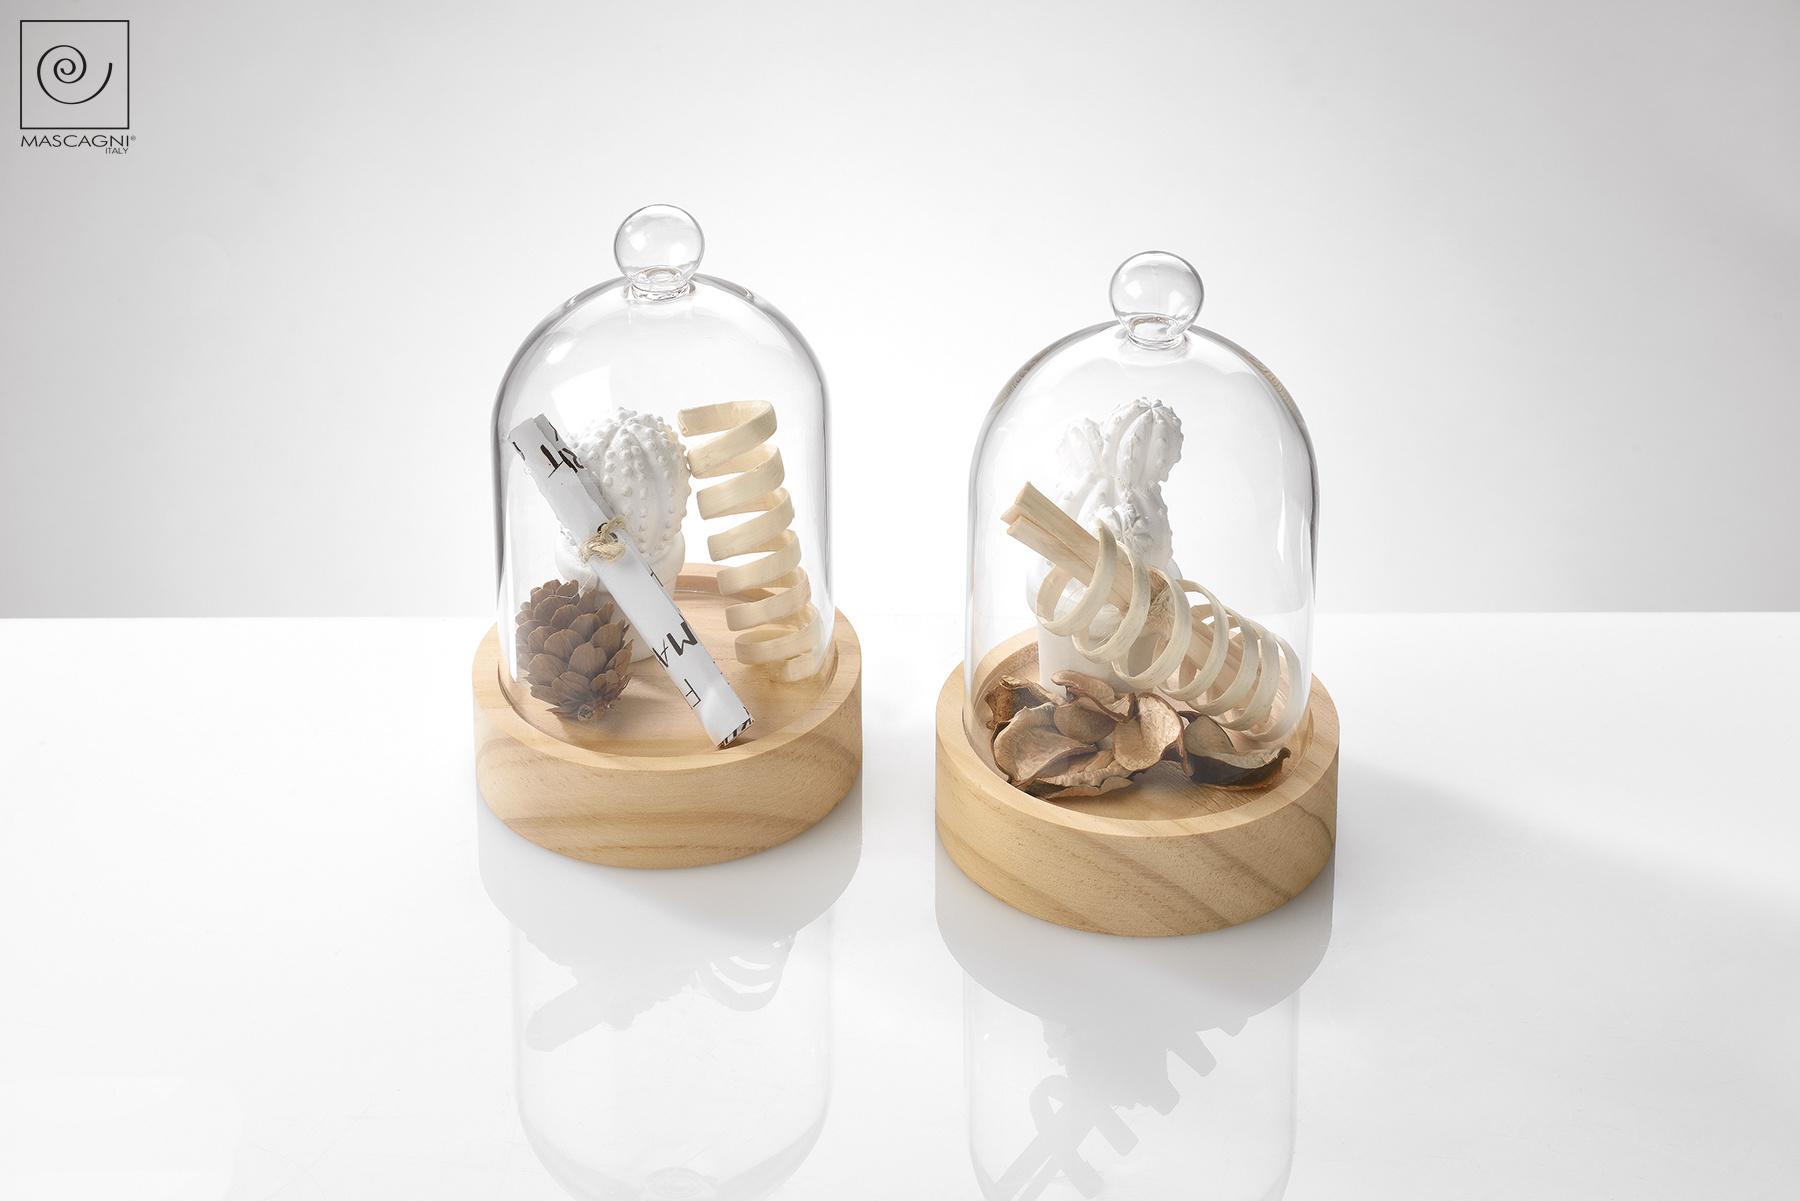 Art Mascagni A926 BELL JAR